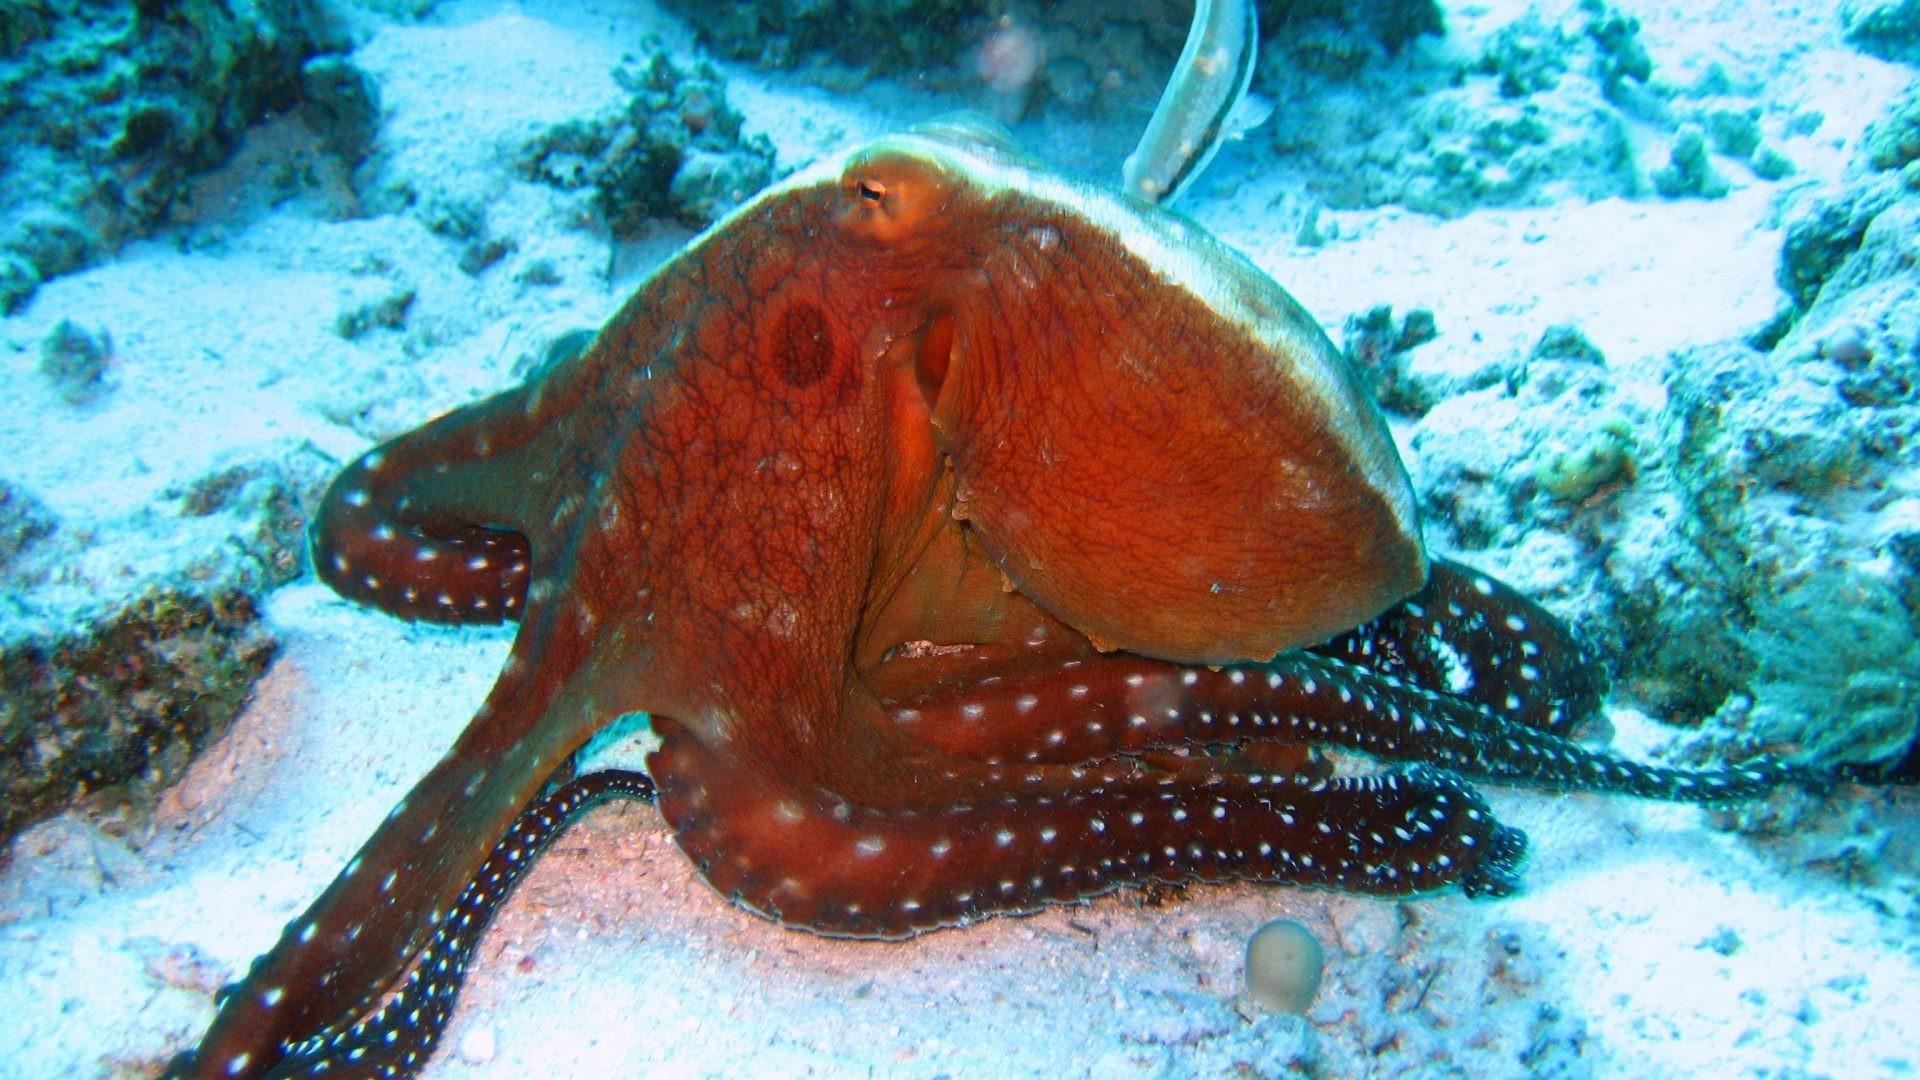 Octopus Tag – Ocean Sea Underwater Octopus Sealife Fish Tank Screensaver  Free Download for HD 16